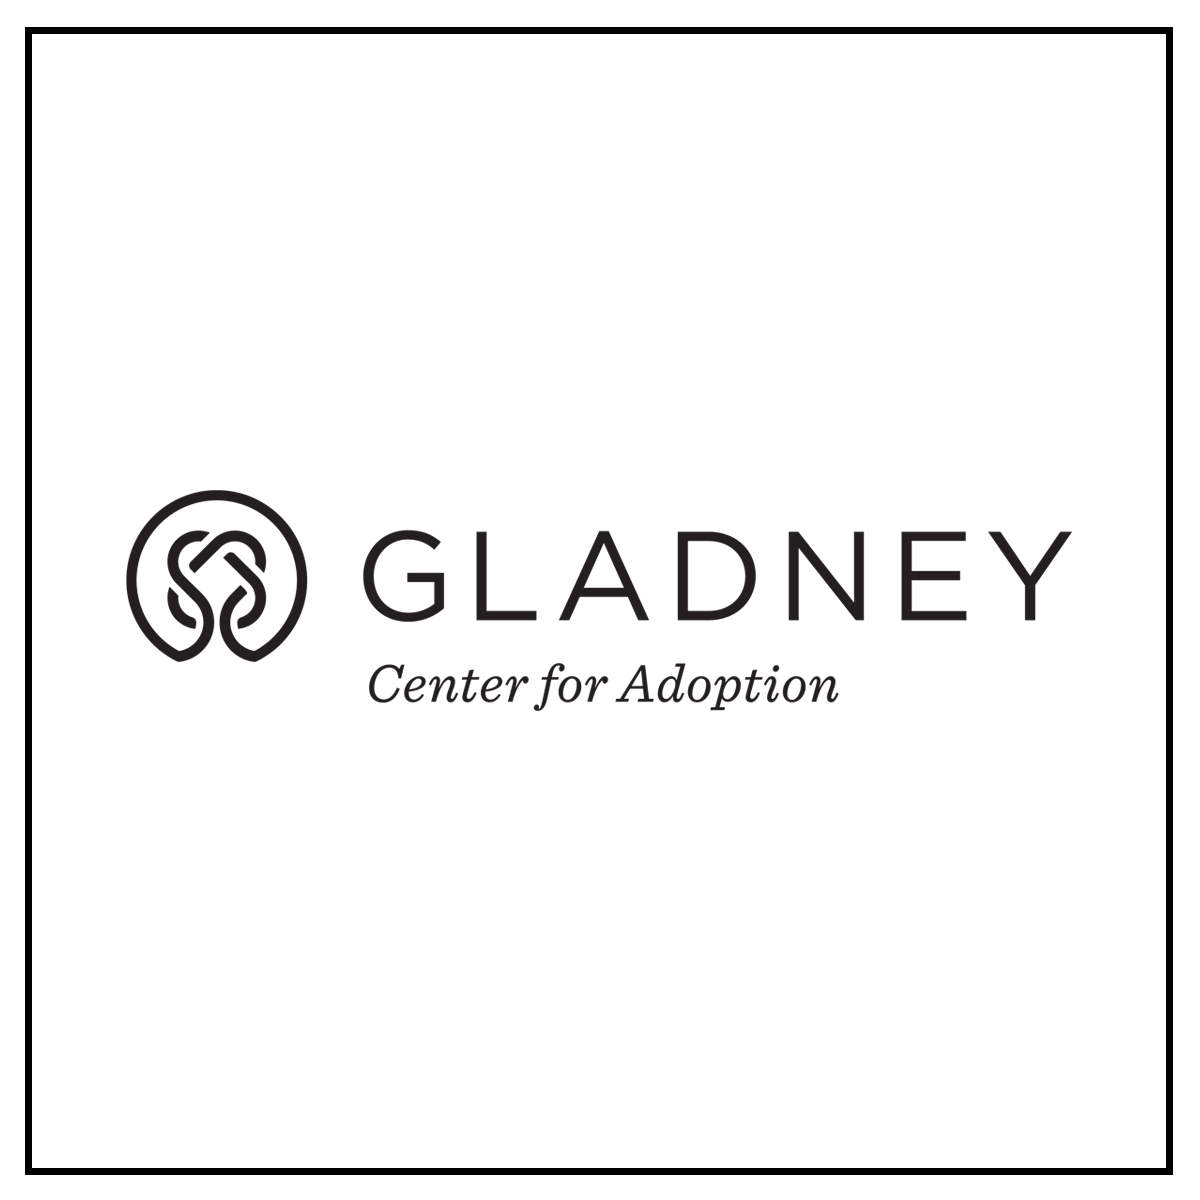 Gladney Logo B+W Square.jpg